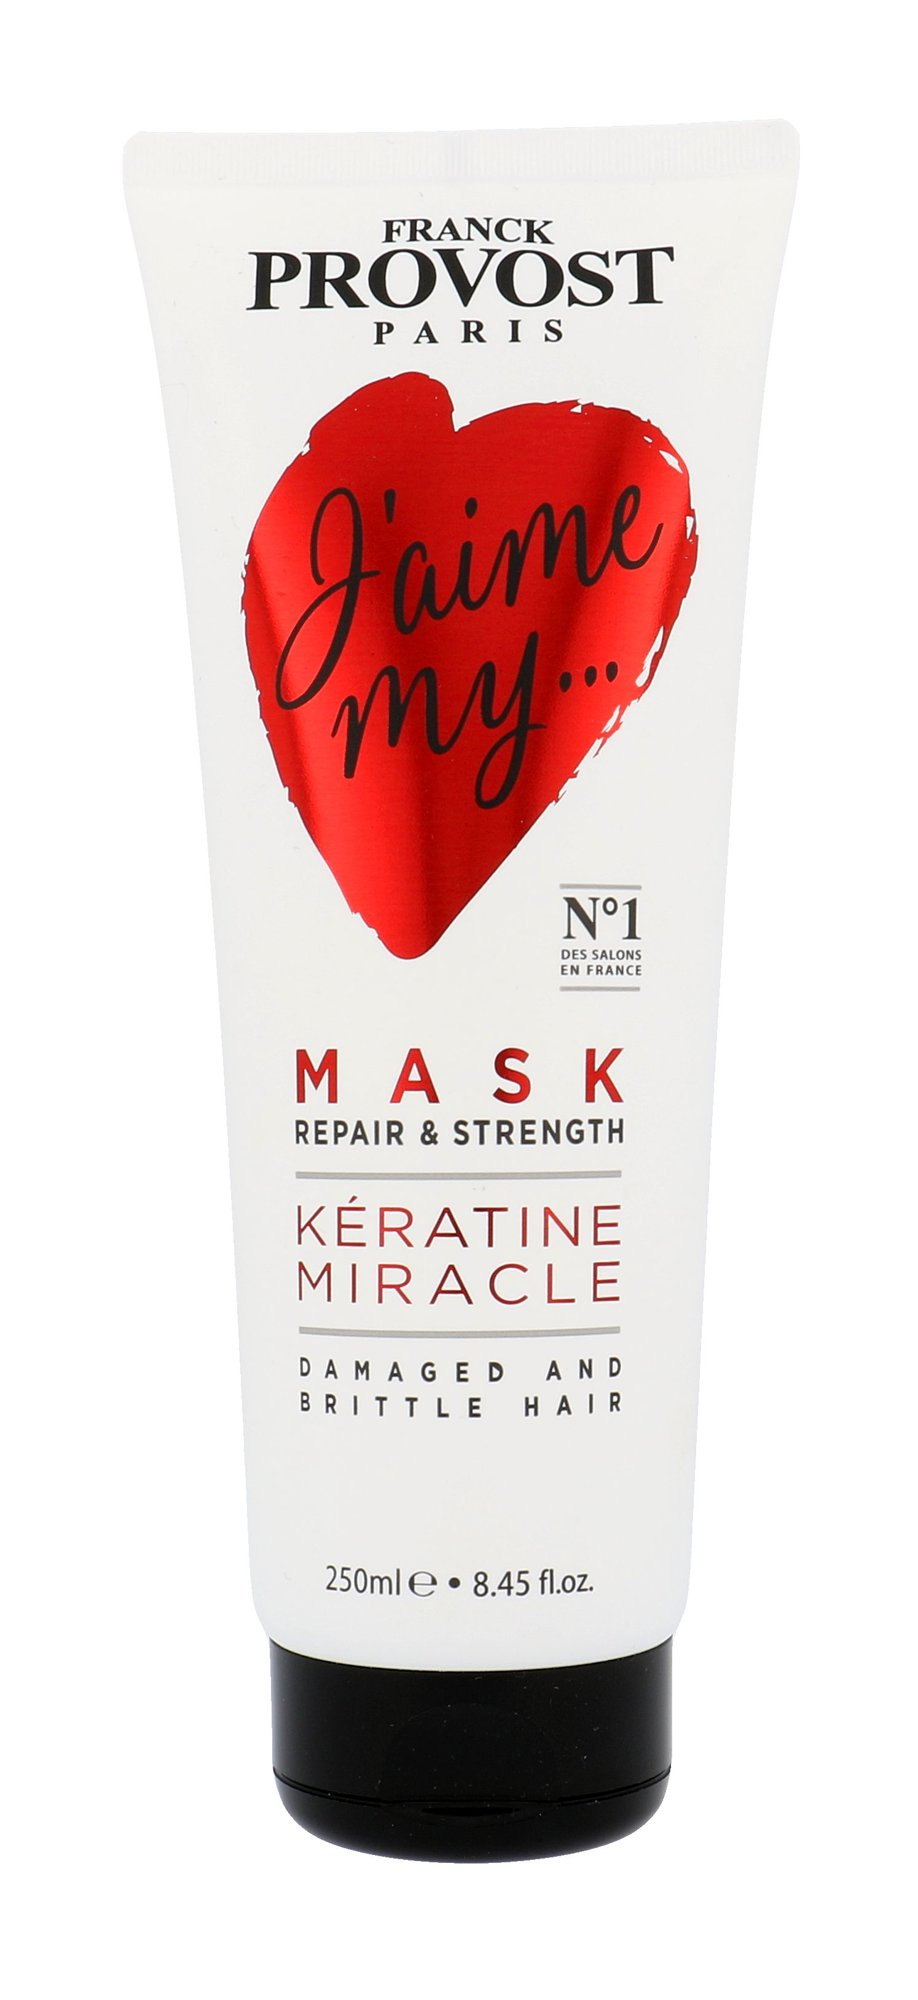 FRANCK PROVOST PARIS J´Aime My... Cosmetic 250ml  Kératine Miracle